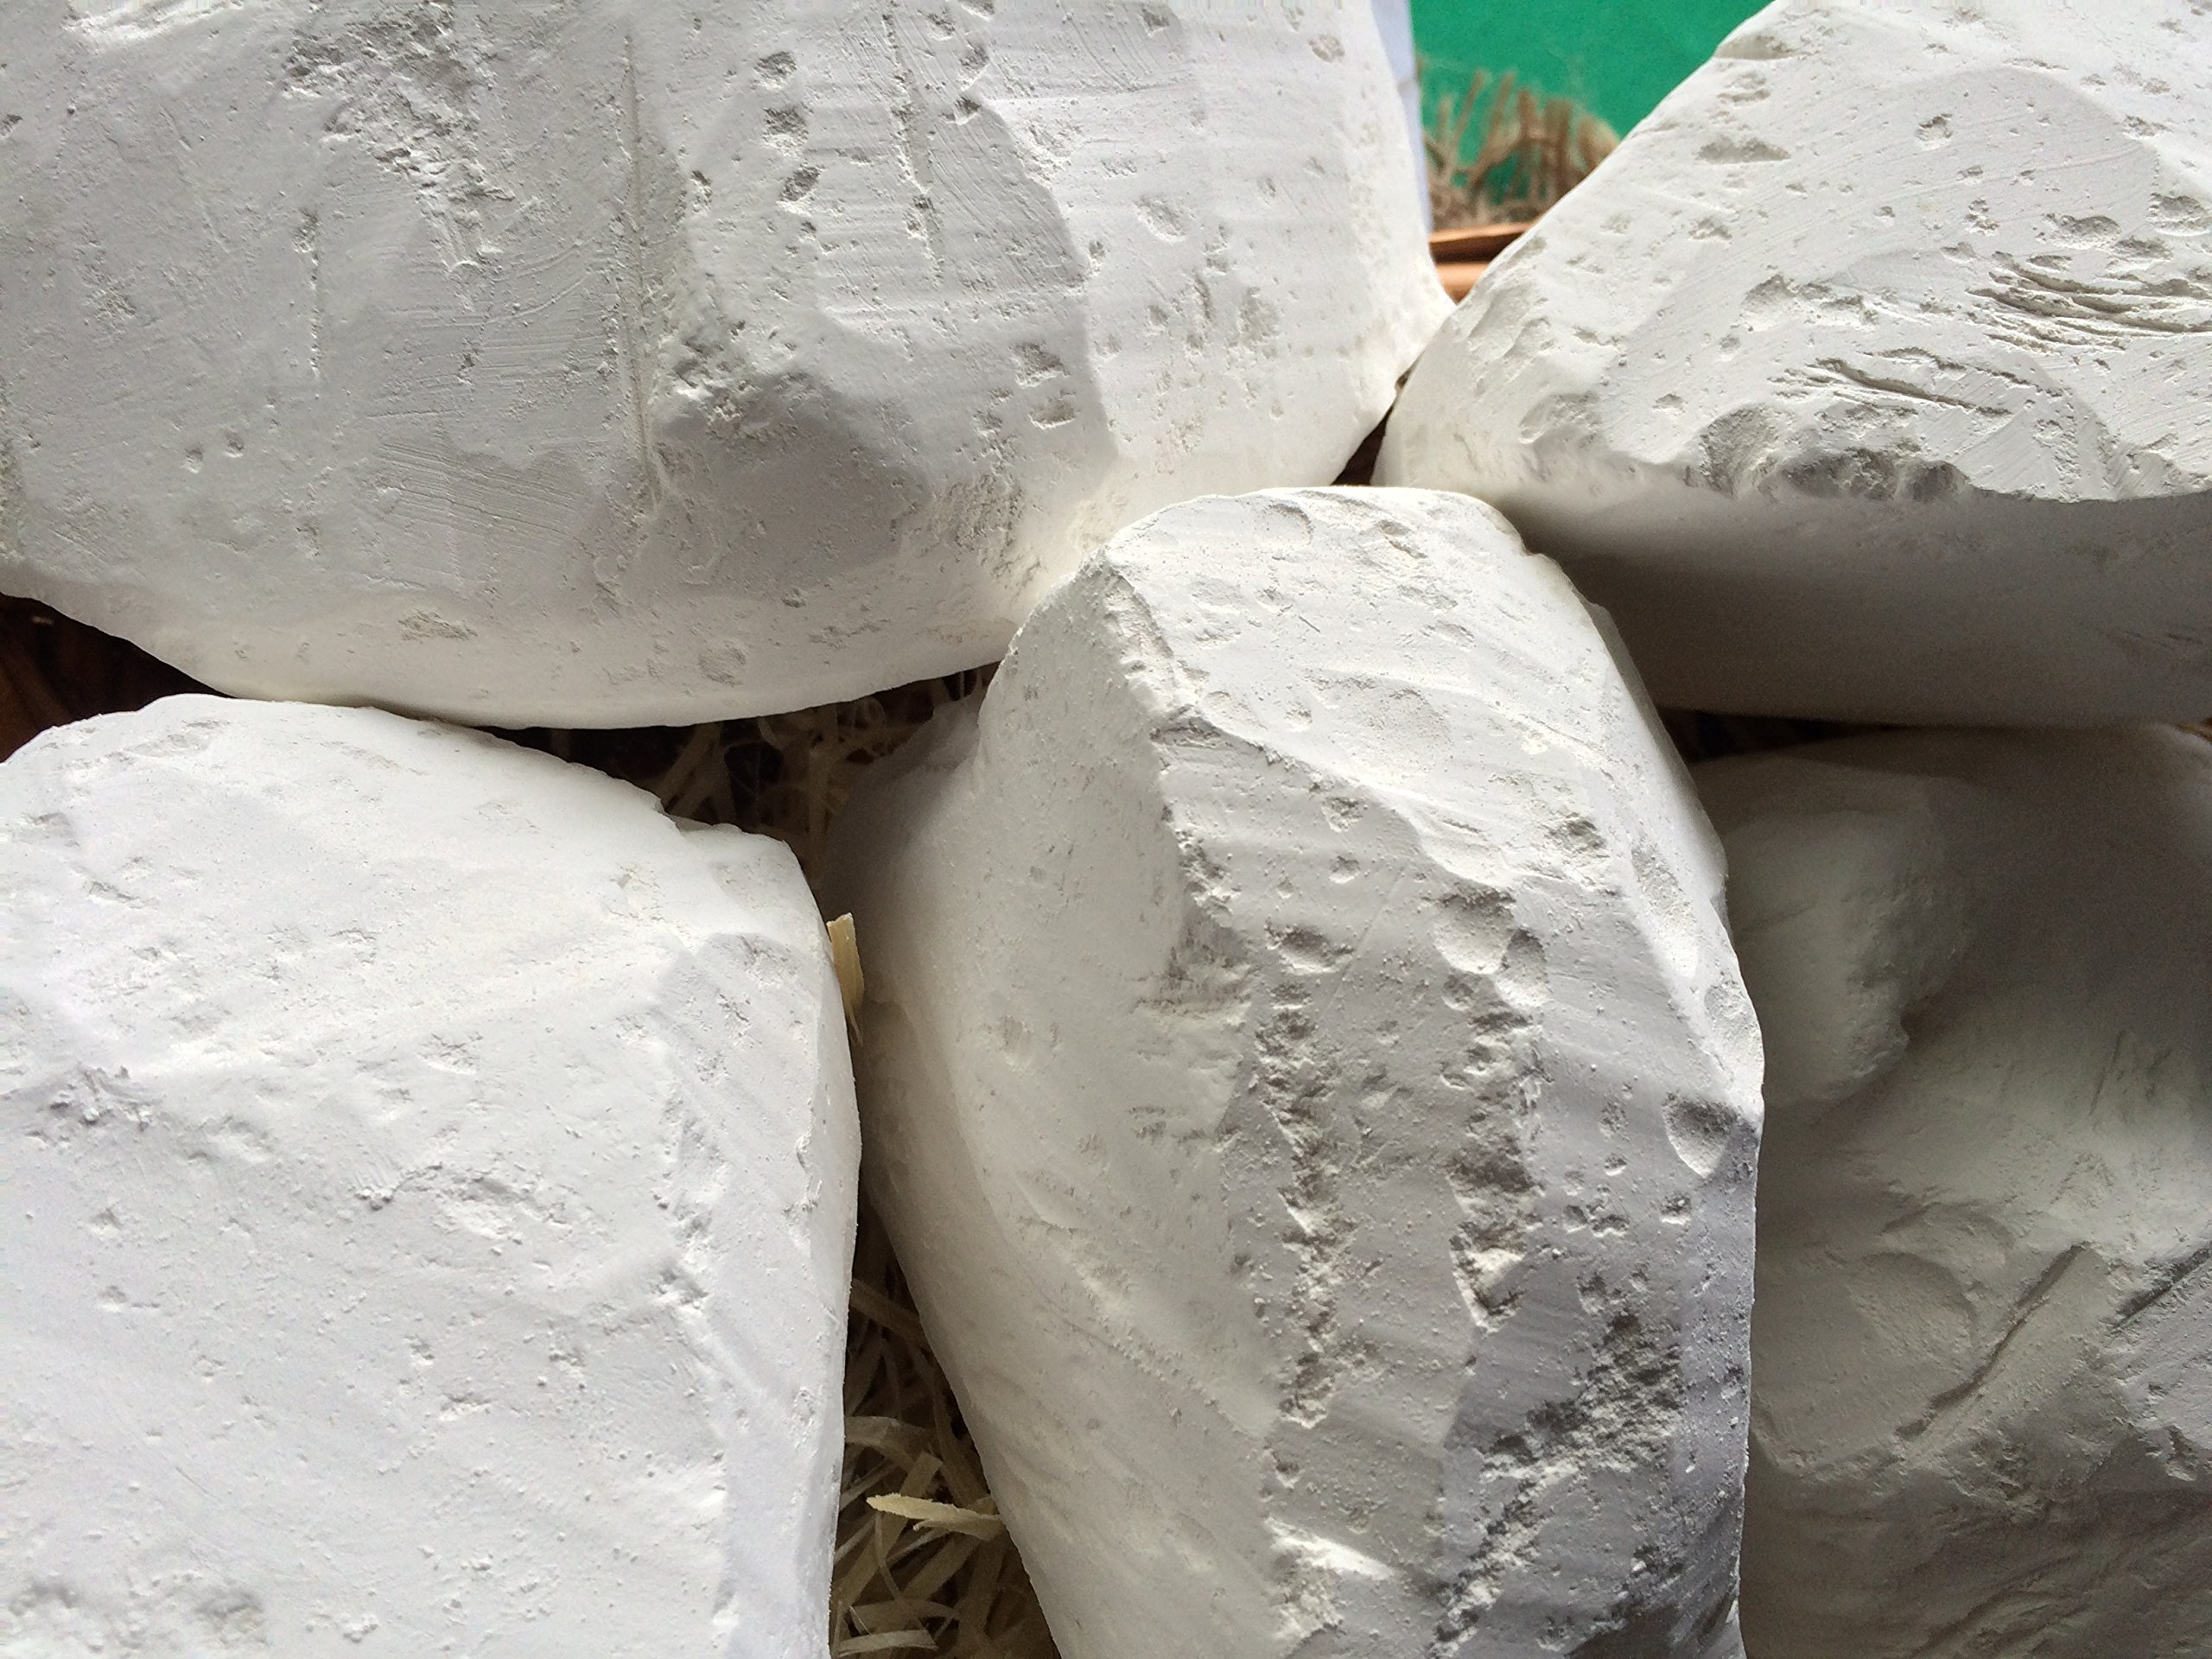 RED Edible Chalk Chunks (lump) Natural for Eating (Food), 1 lb (450 g)